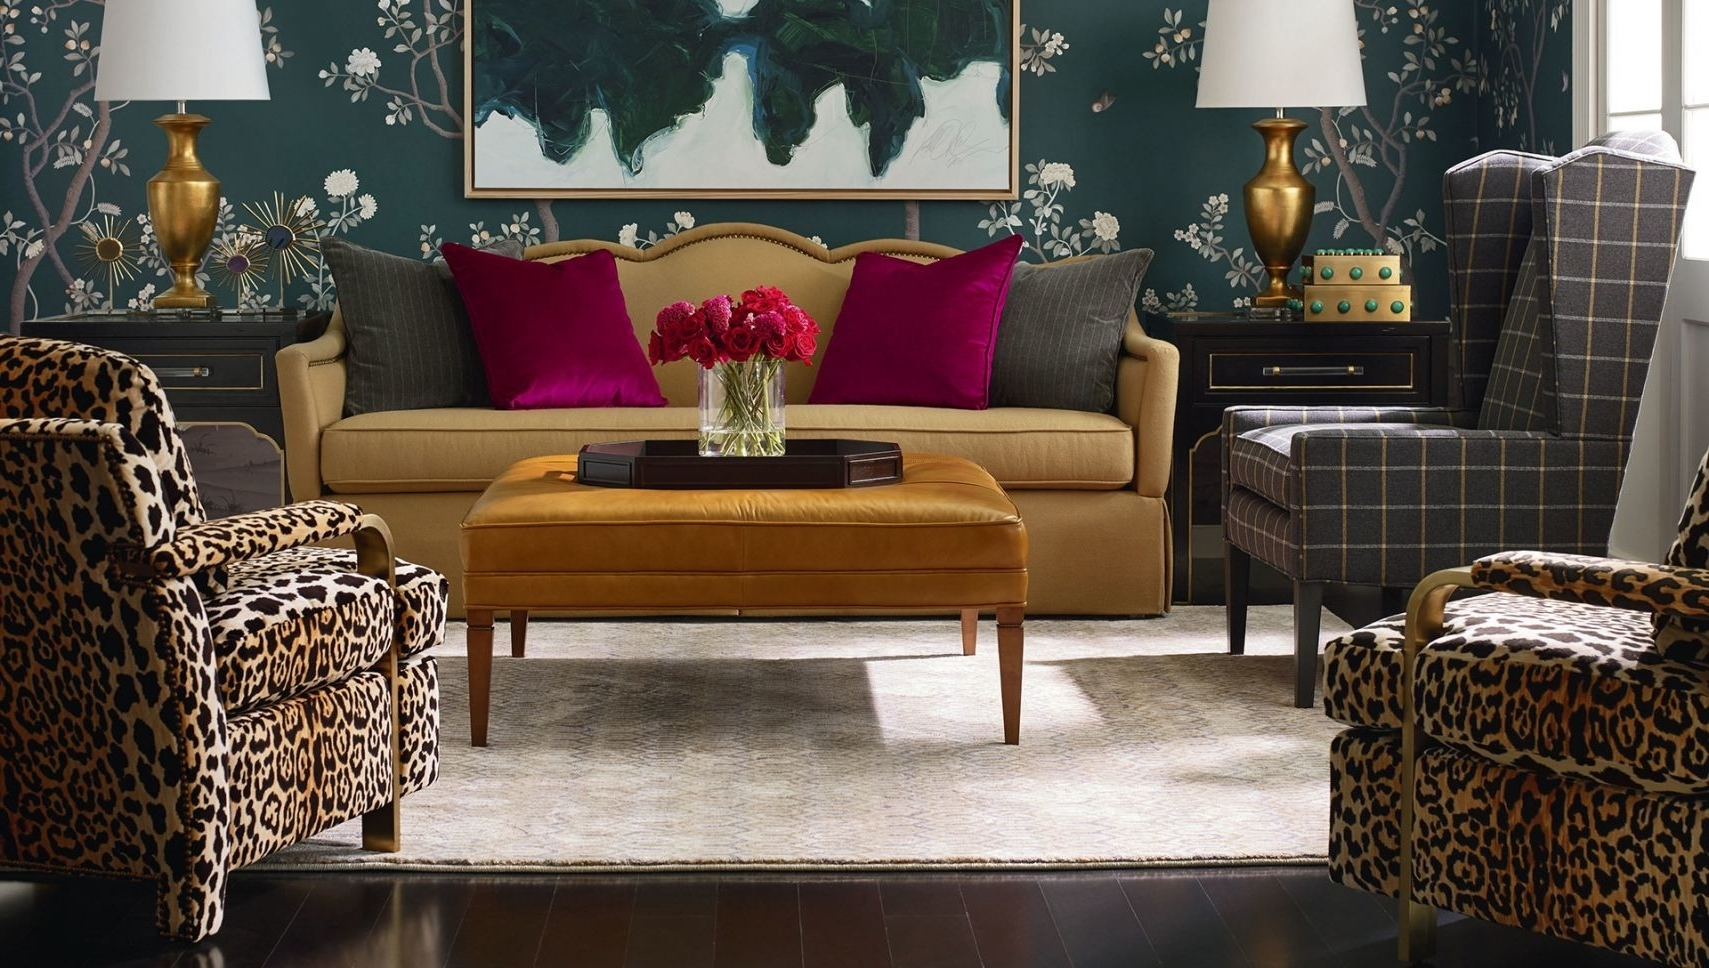 Preferred Powells Furniture Richmond Va Rooms To Go Midlothian Va Sofa Within Virginia Beach Sectional Sofas (View 14 of 20)